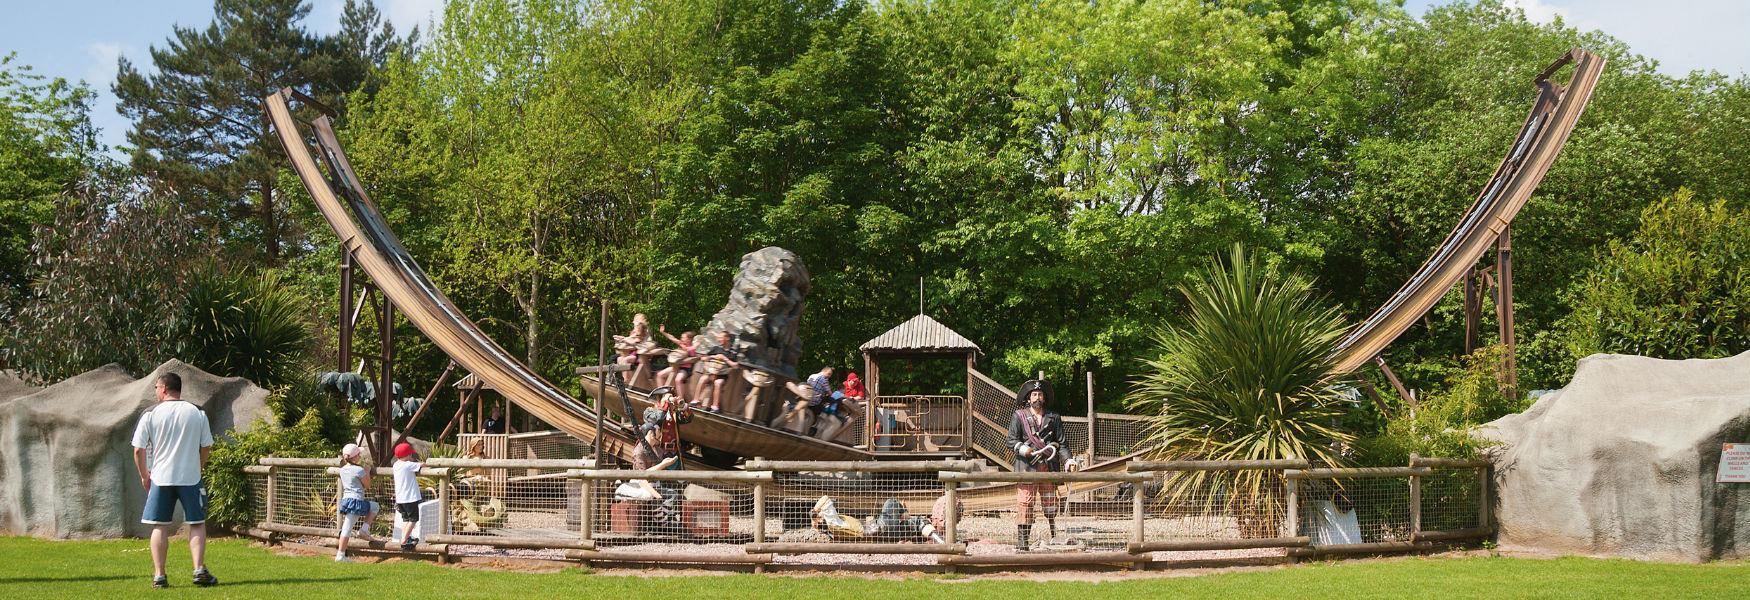 Gulliver's World Resort